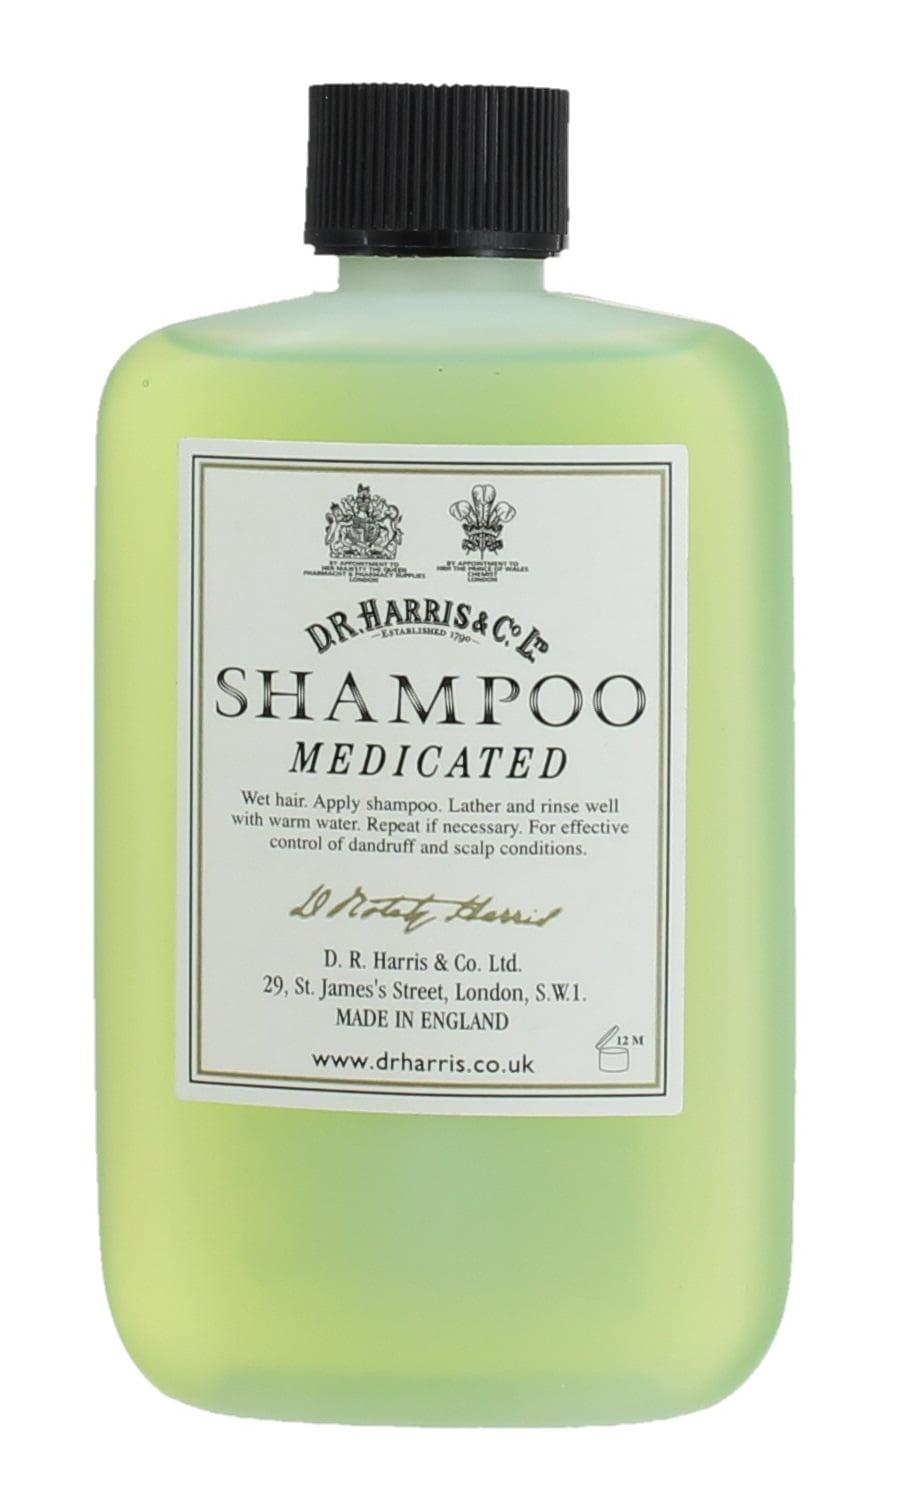 DR HARRIS Medicated Shampoo